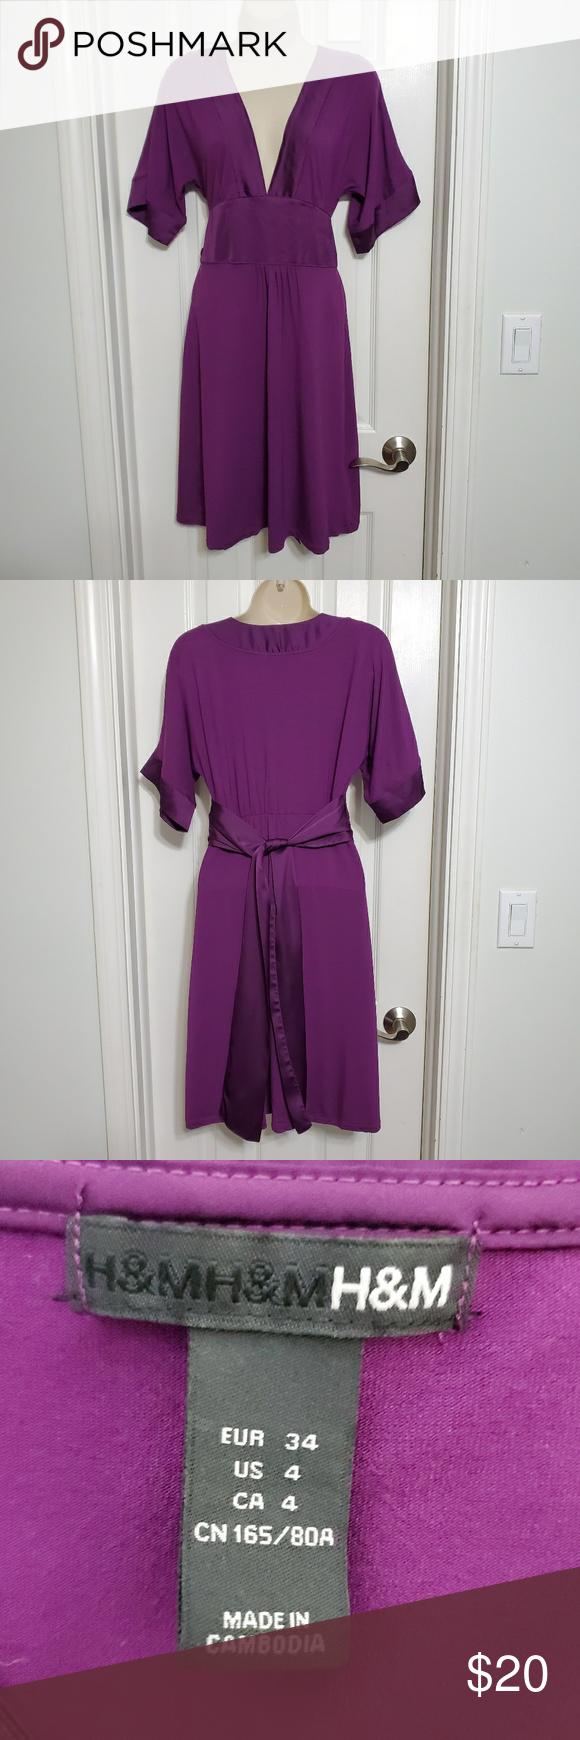 H M Purple V Neck Dress With Silky Trim Size 4 Clothes Design Fashion Colorful Dresses [ 1740 x 580 Pixel ]